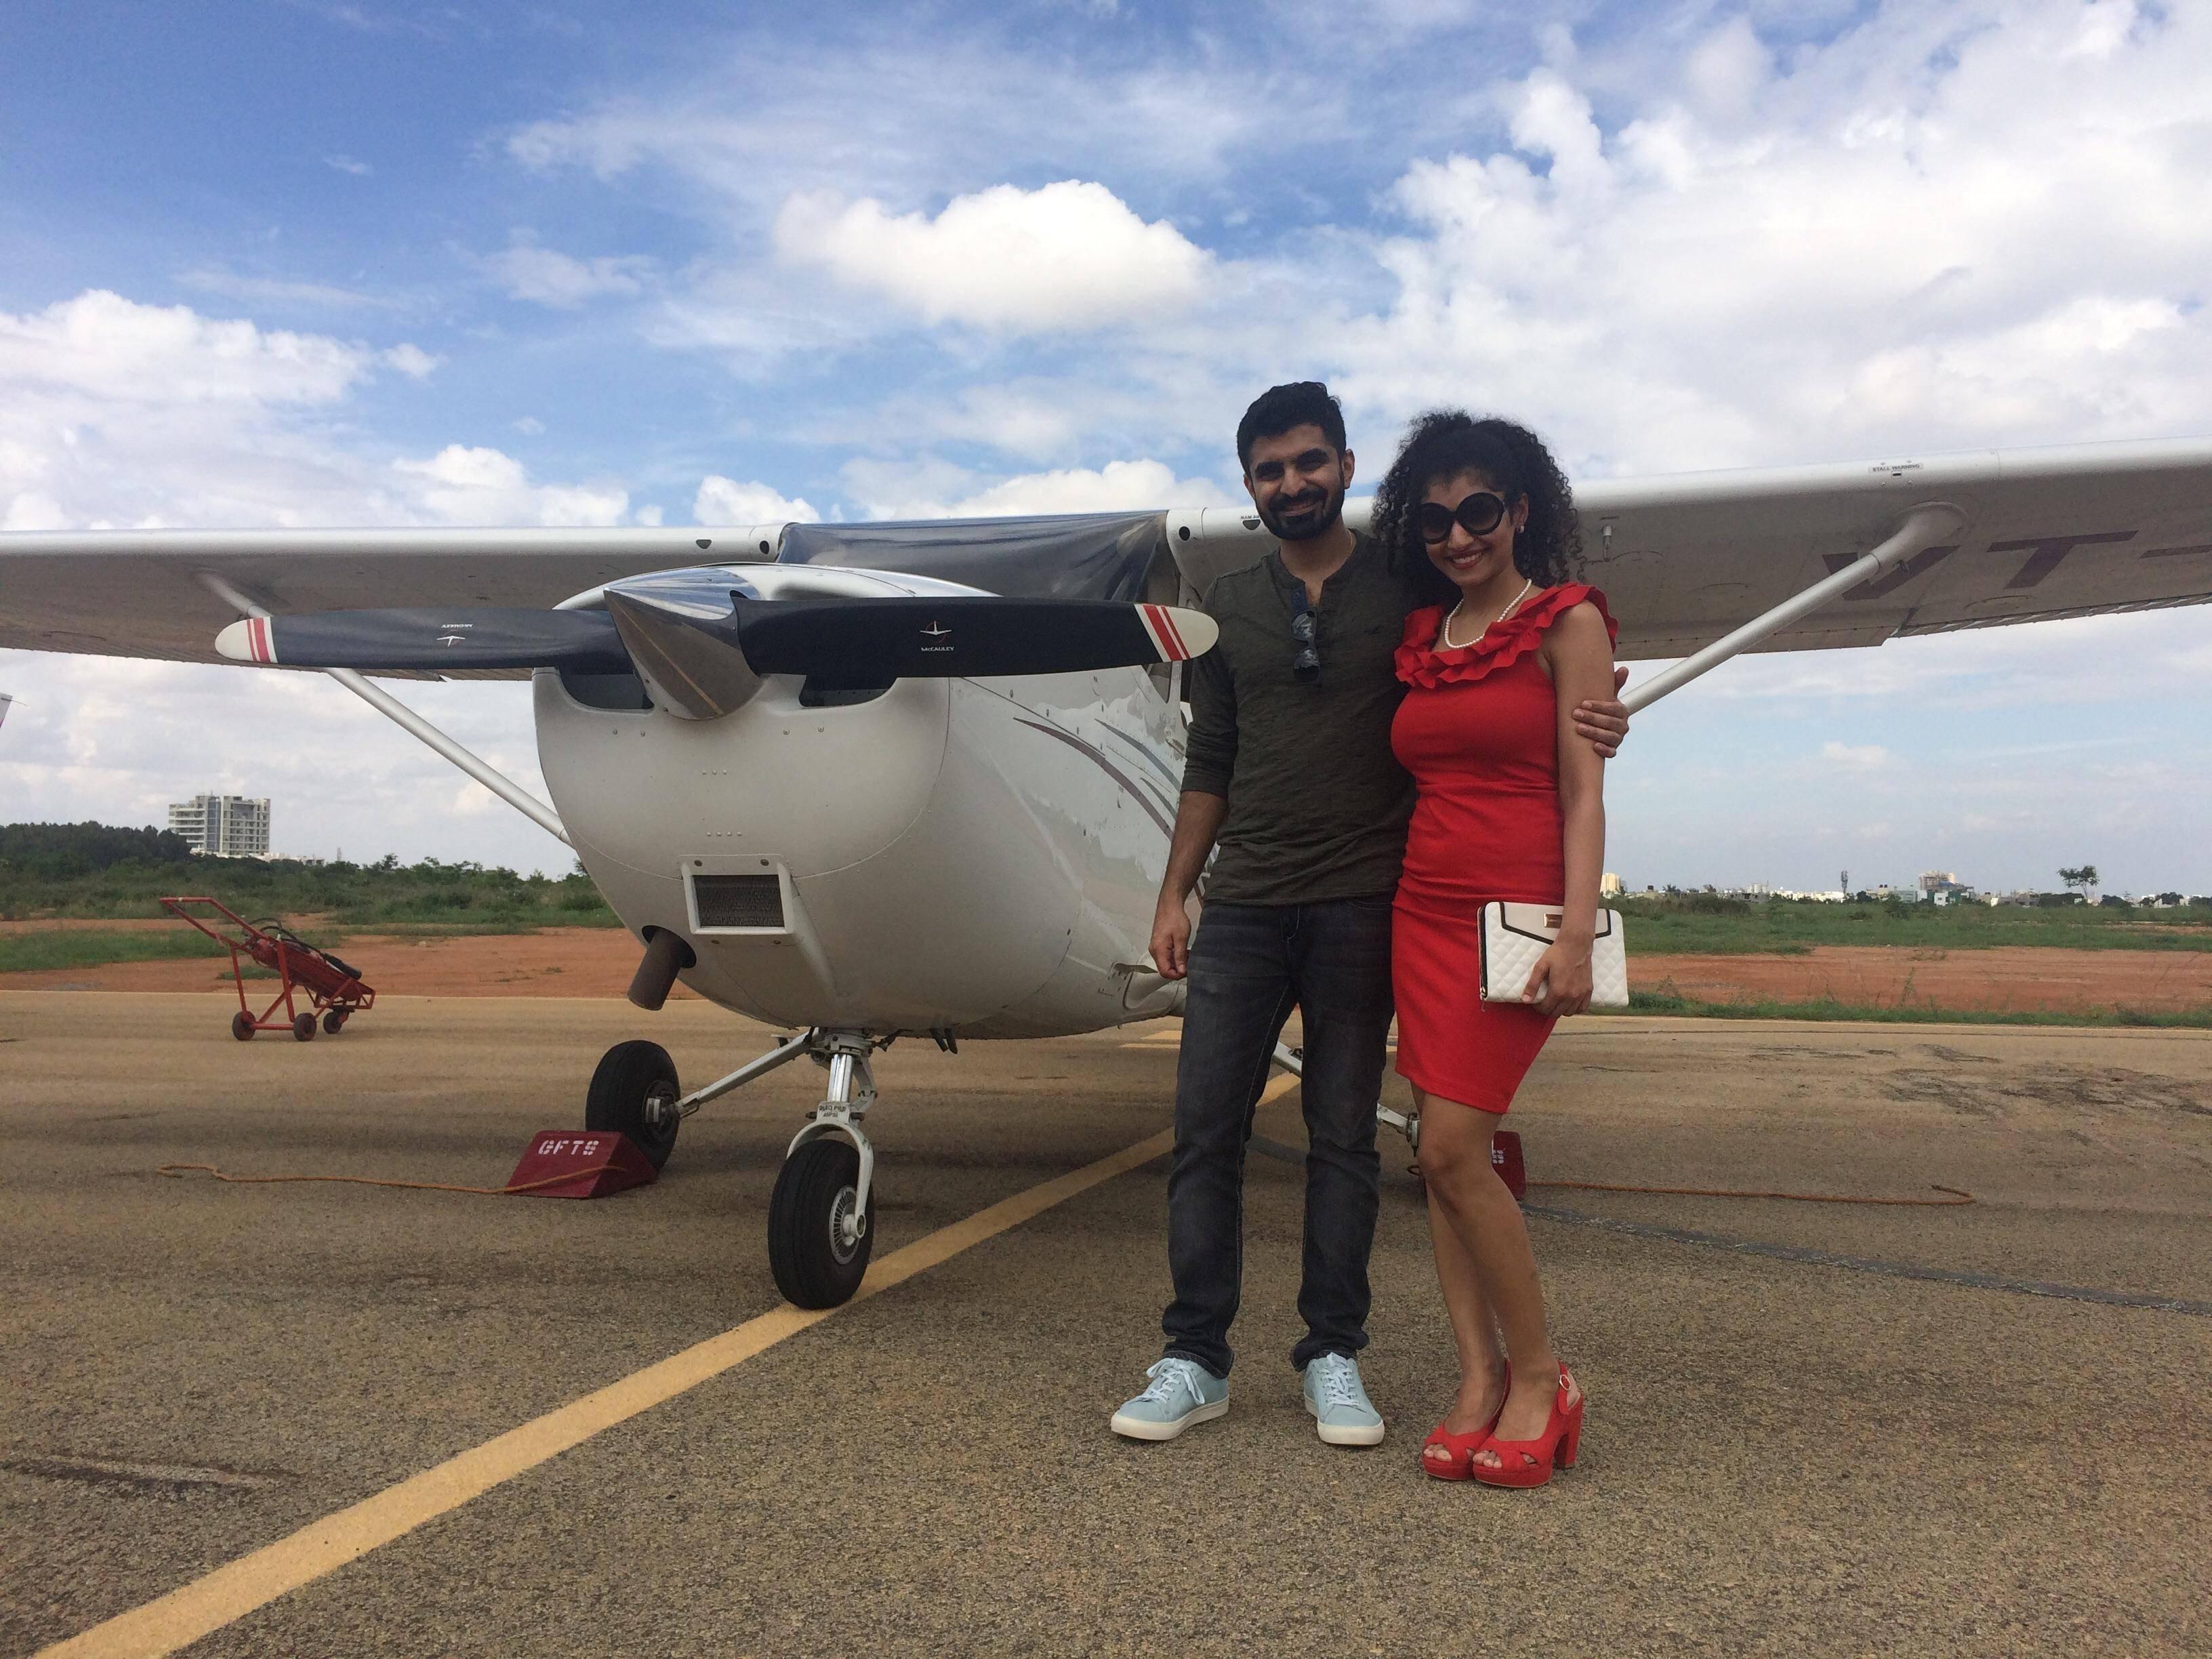 Airplane Joyride Bangalore at Jakkur, Bangalore - Events High